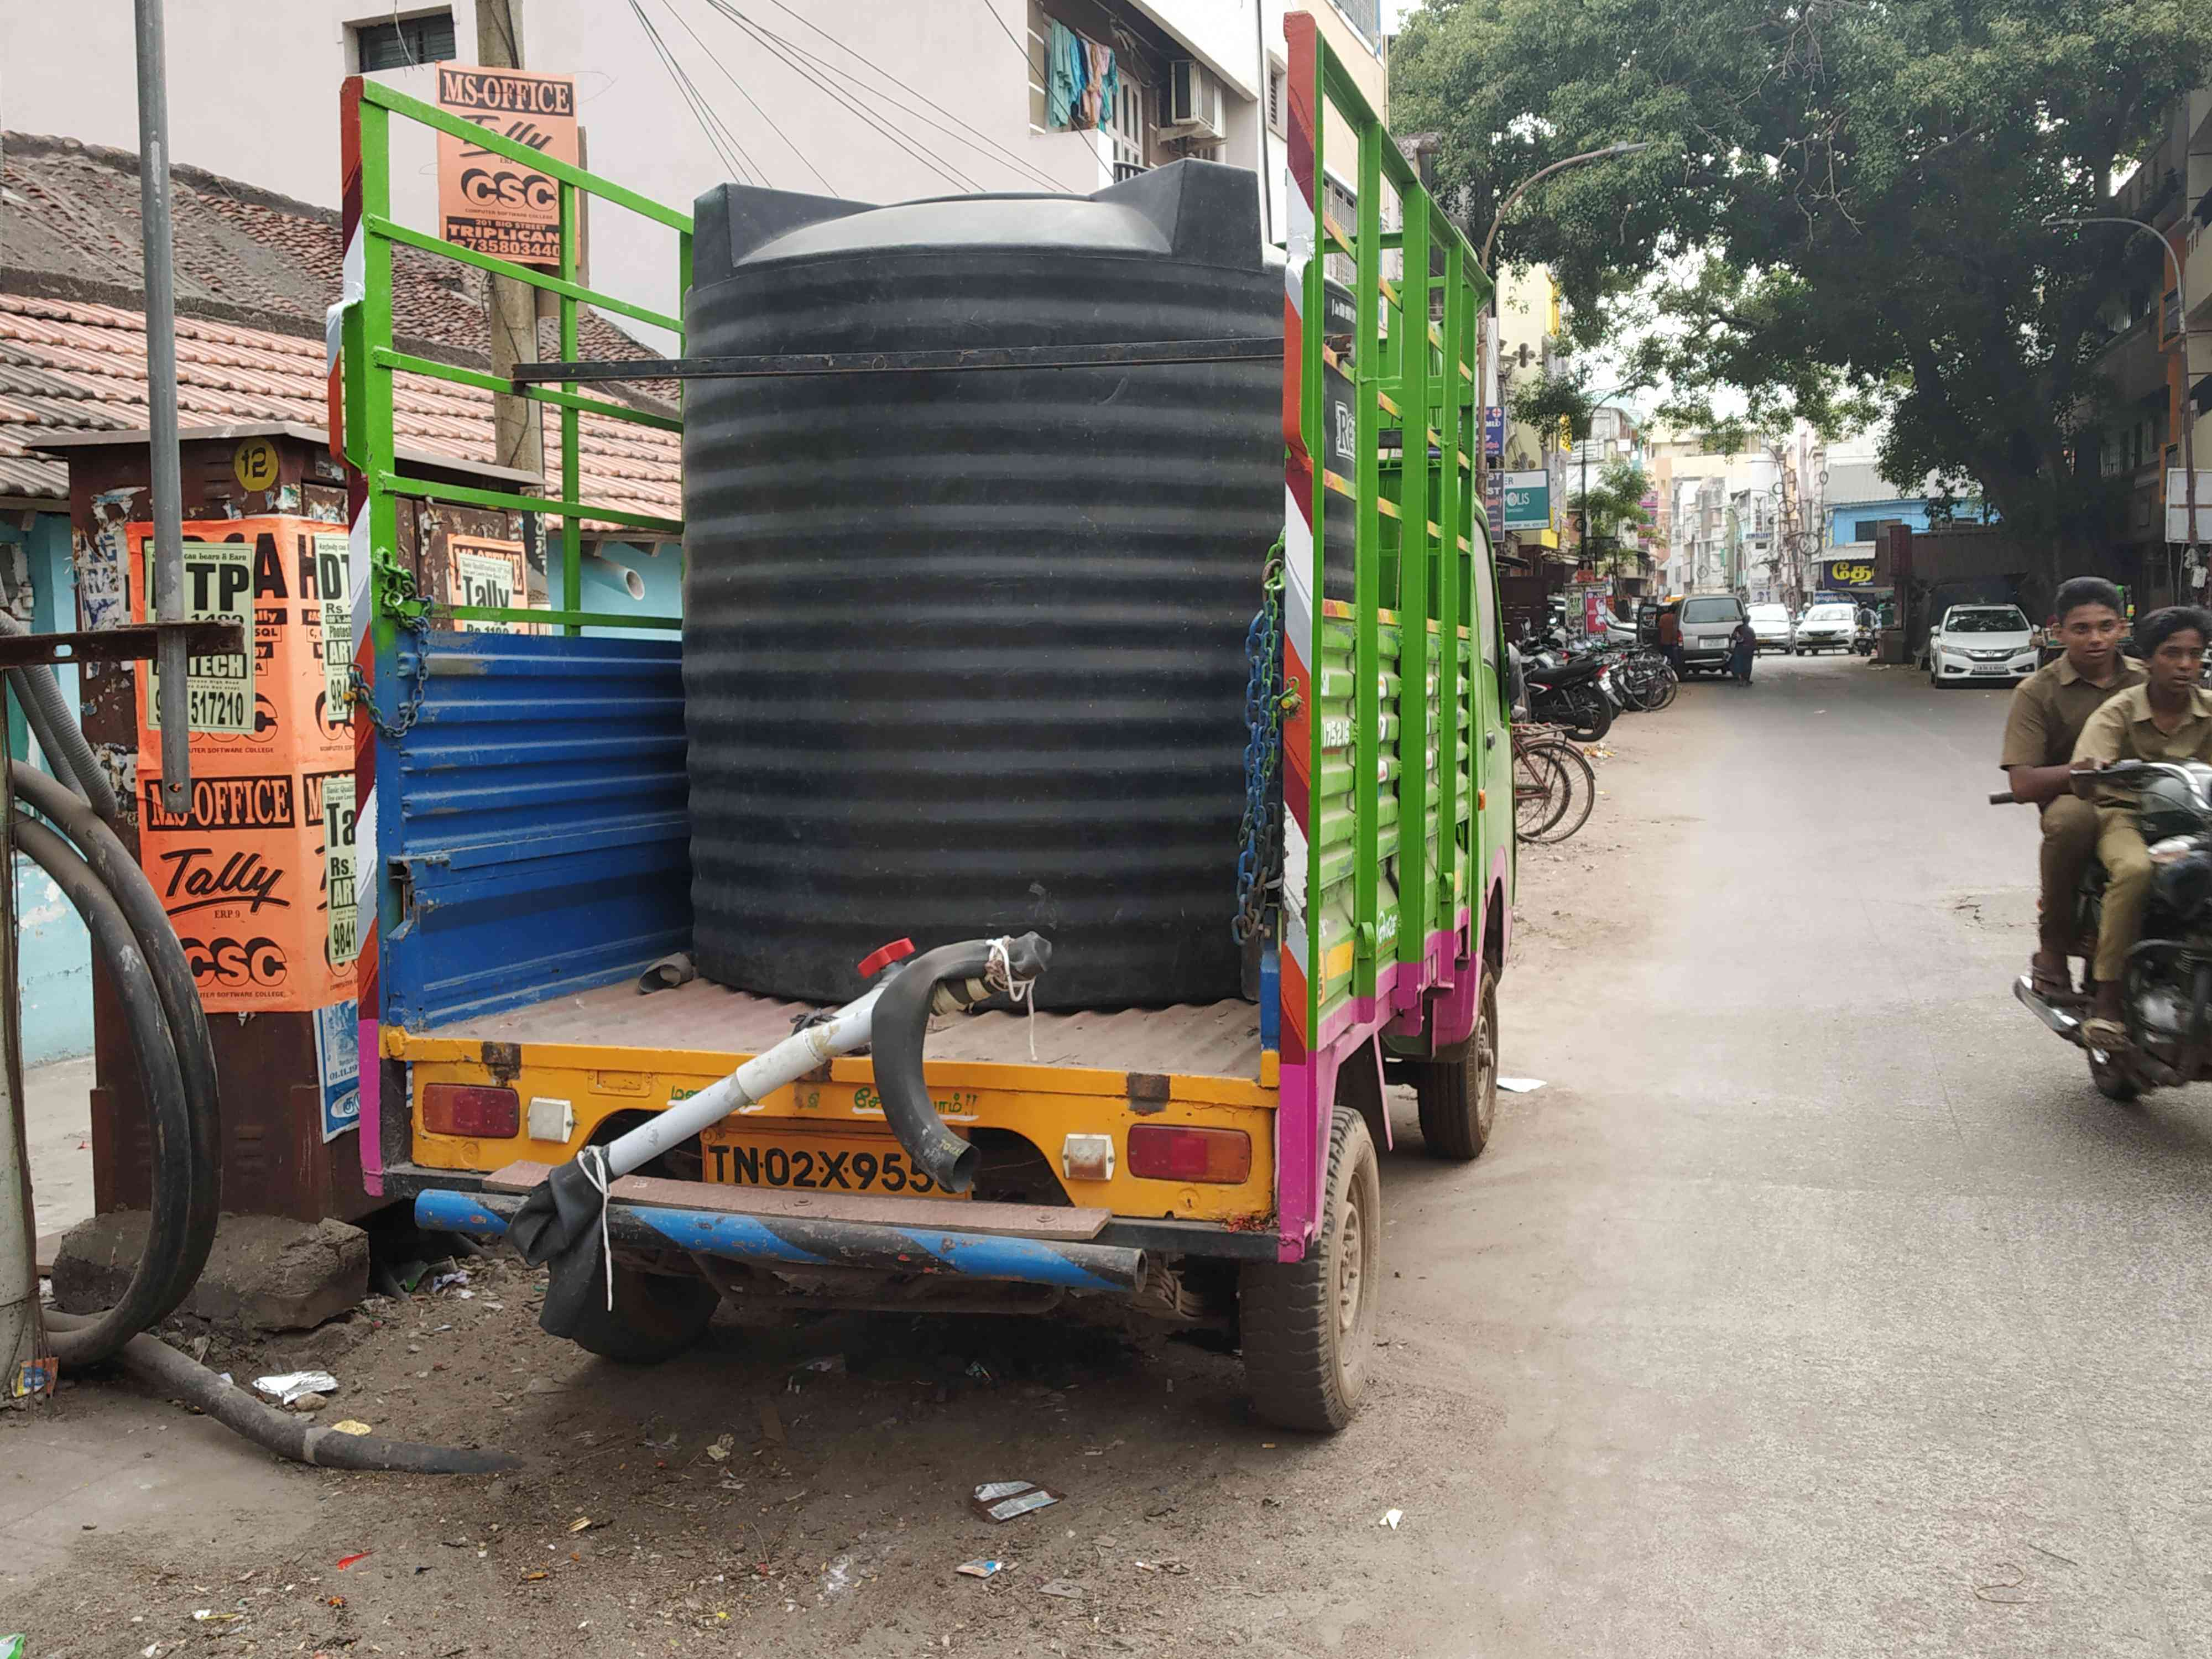 A smaller water tanker supplying drinking water to residents in narrow lanes in Chennai. Credit: Sruthisagar Yamaun